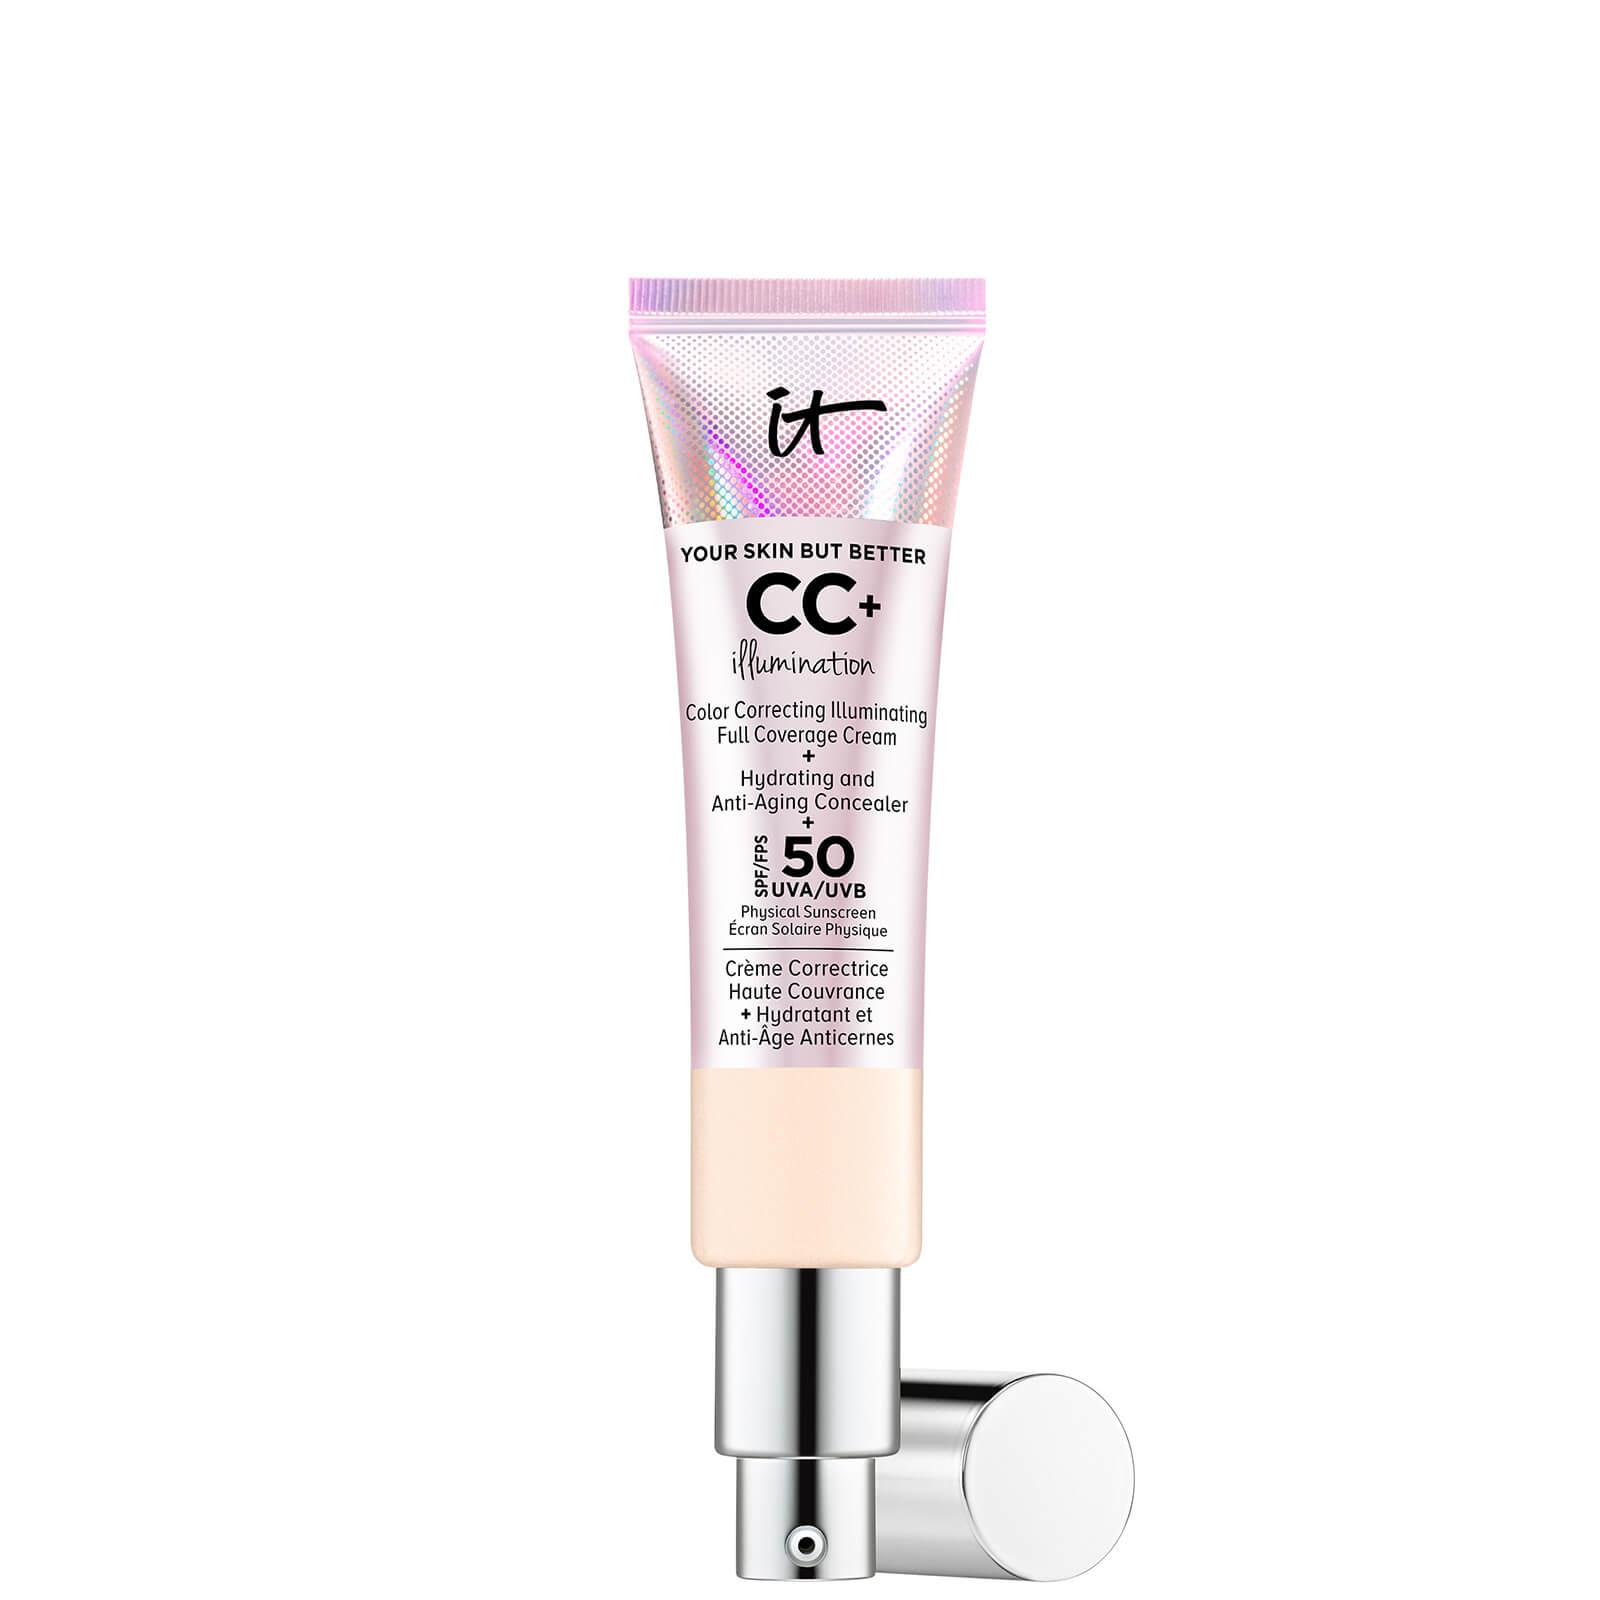 Купить IT Cosmetics Your Skin But Better CC+ Illumination SPF50 32ml (Various Shades) - Fair-Light